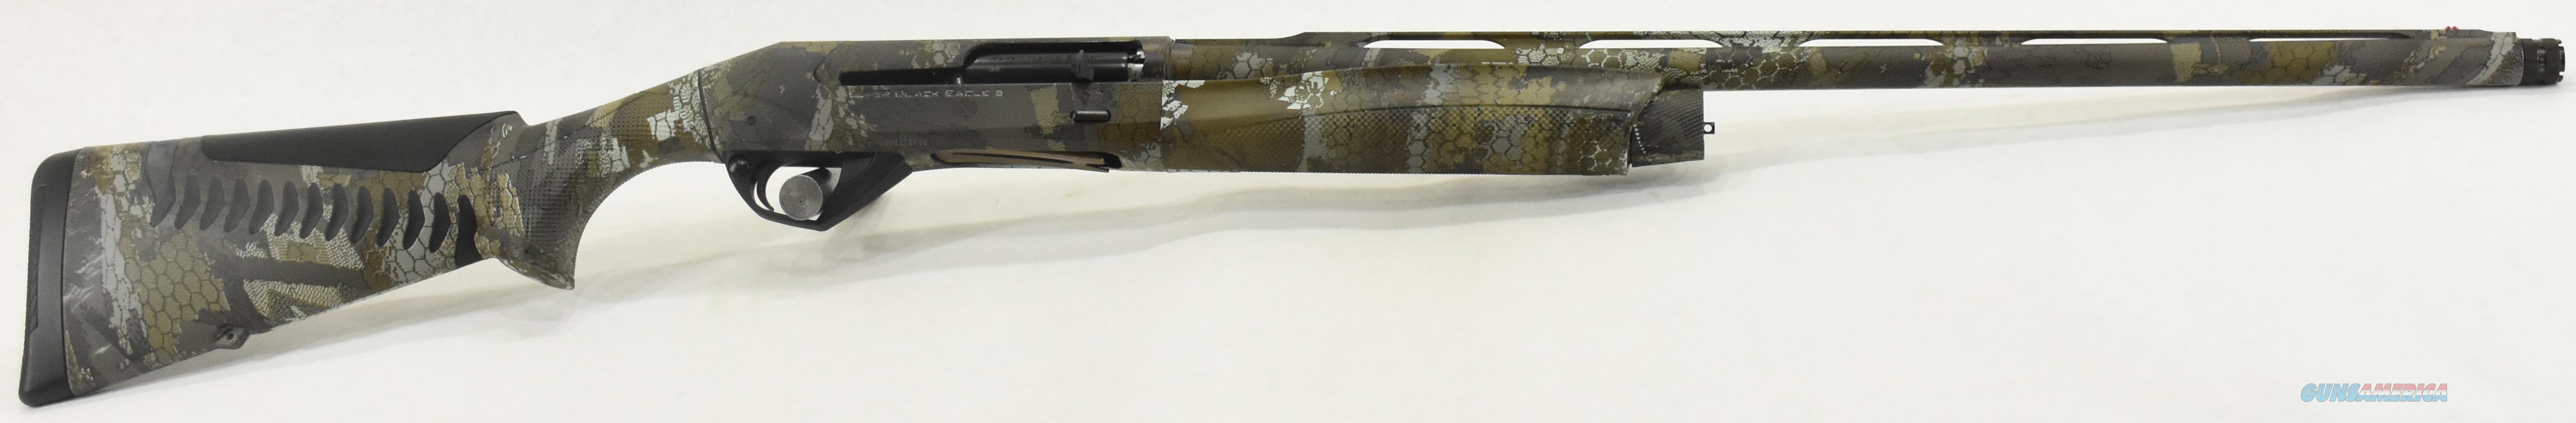 10360 Benelli Super Black Eagle 3 Gore Optifade Timber 12 Ga 26-3.5In  Guns > Shotguns > Benelli Shotguns > Sporting